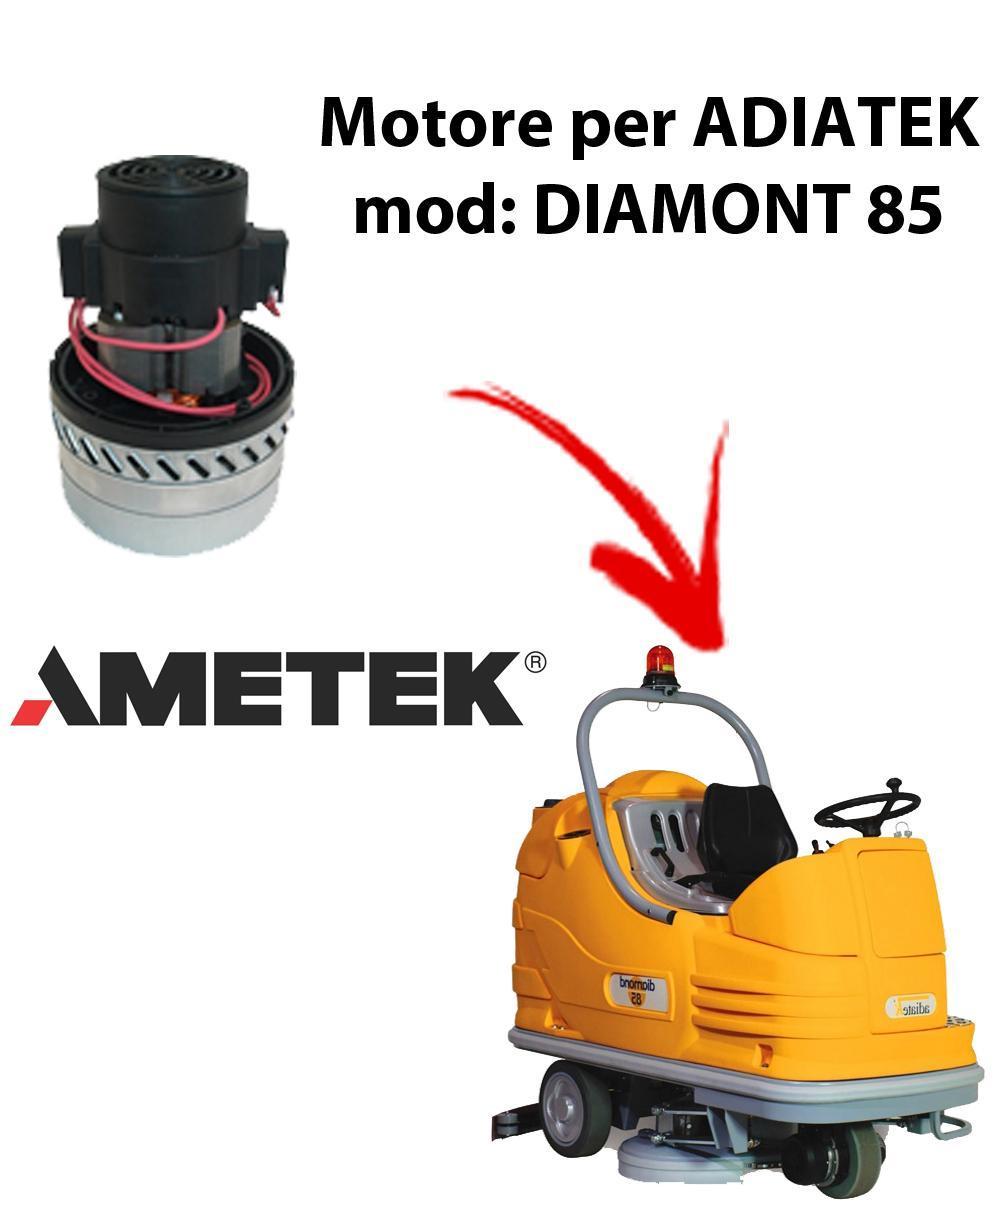 Diamond 85 MOTEUR AMETEK ITALIA aspiration autolaveuses pour Adiatek